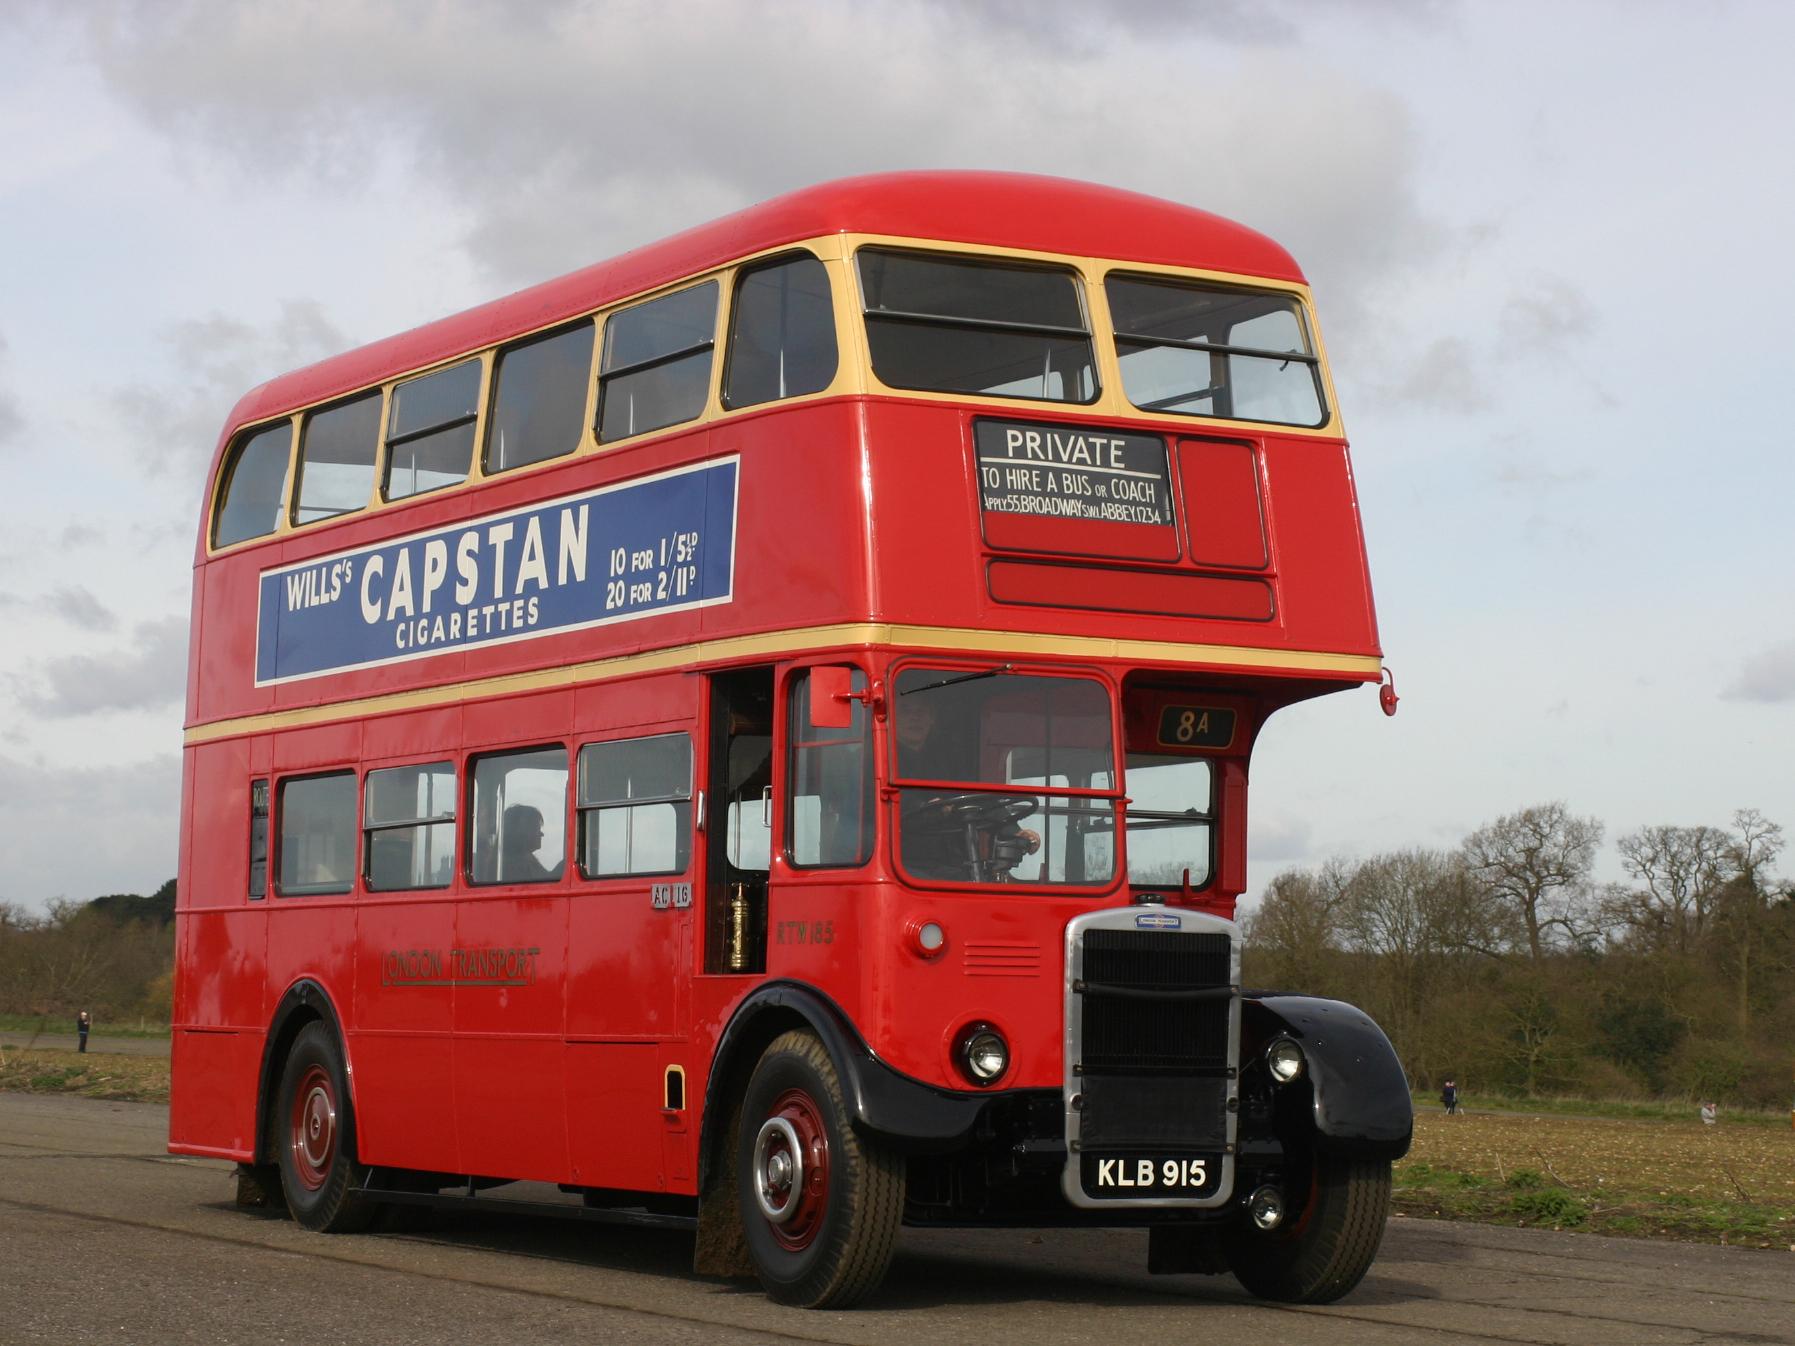 London Transport:<br>KLB915